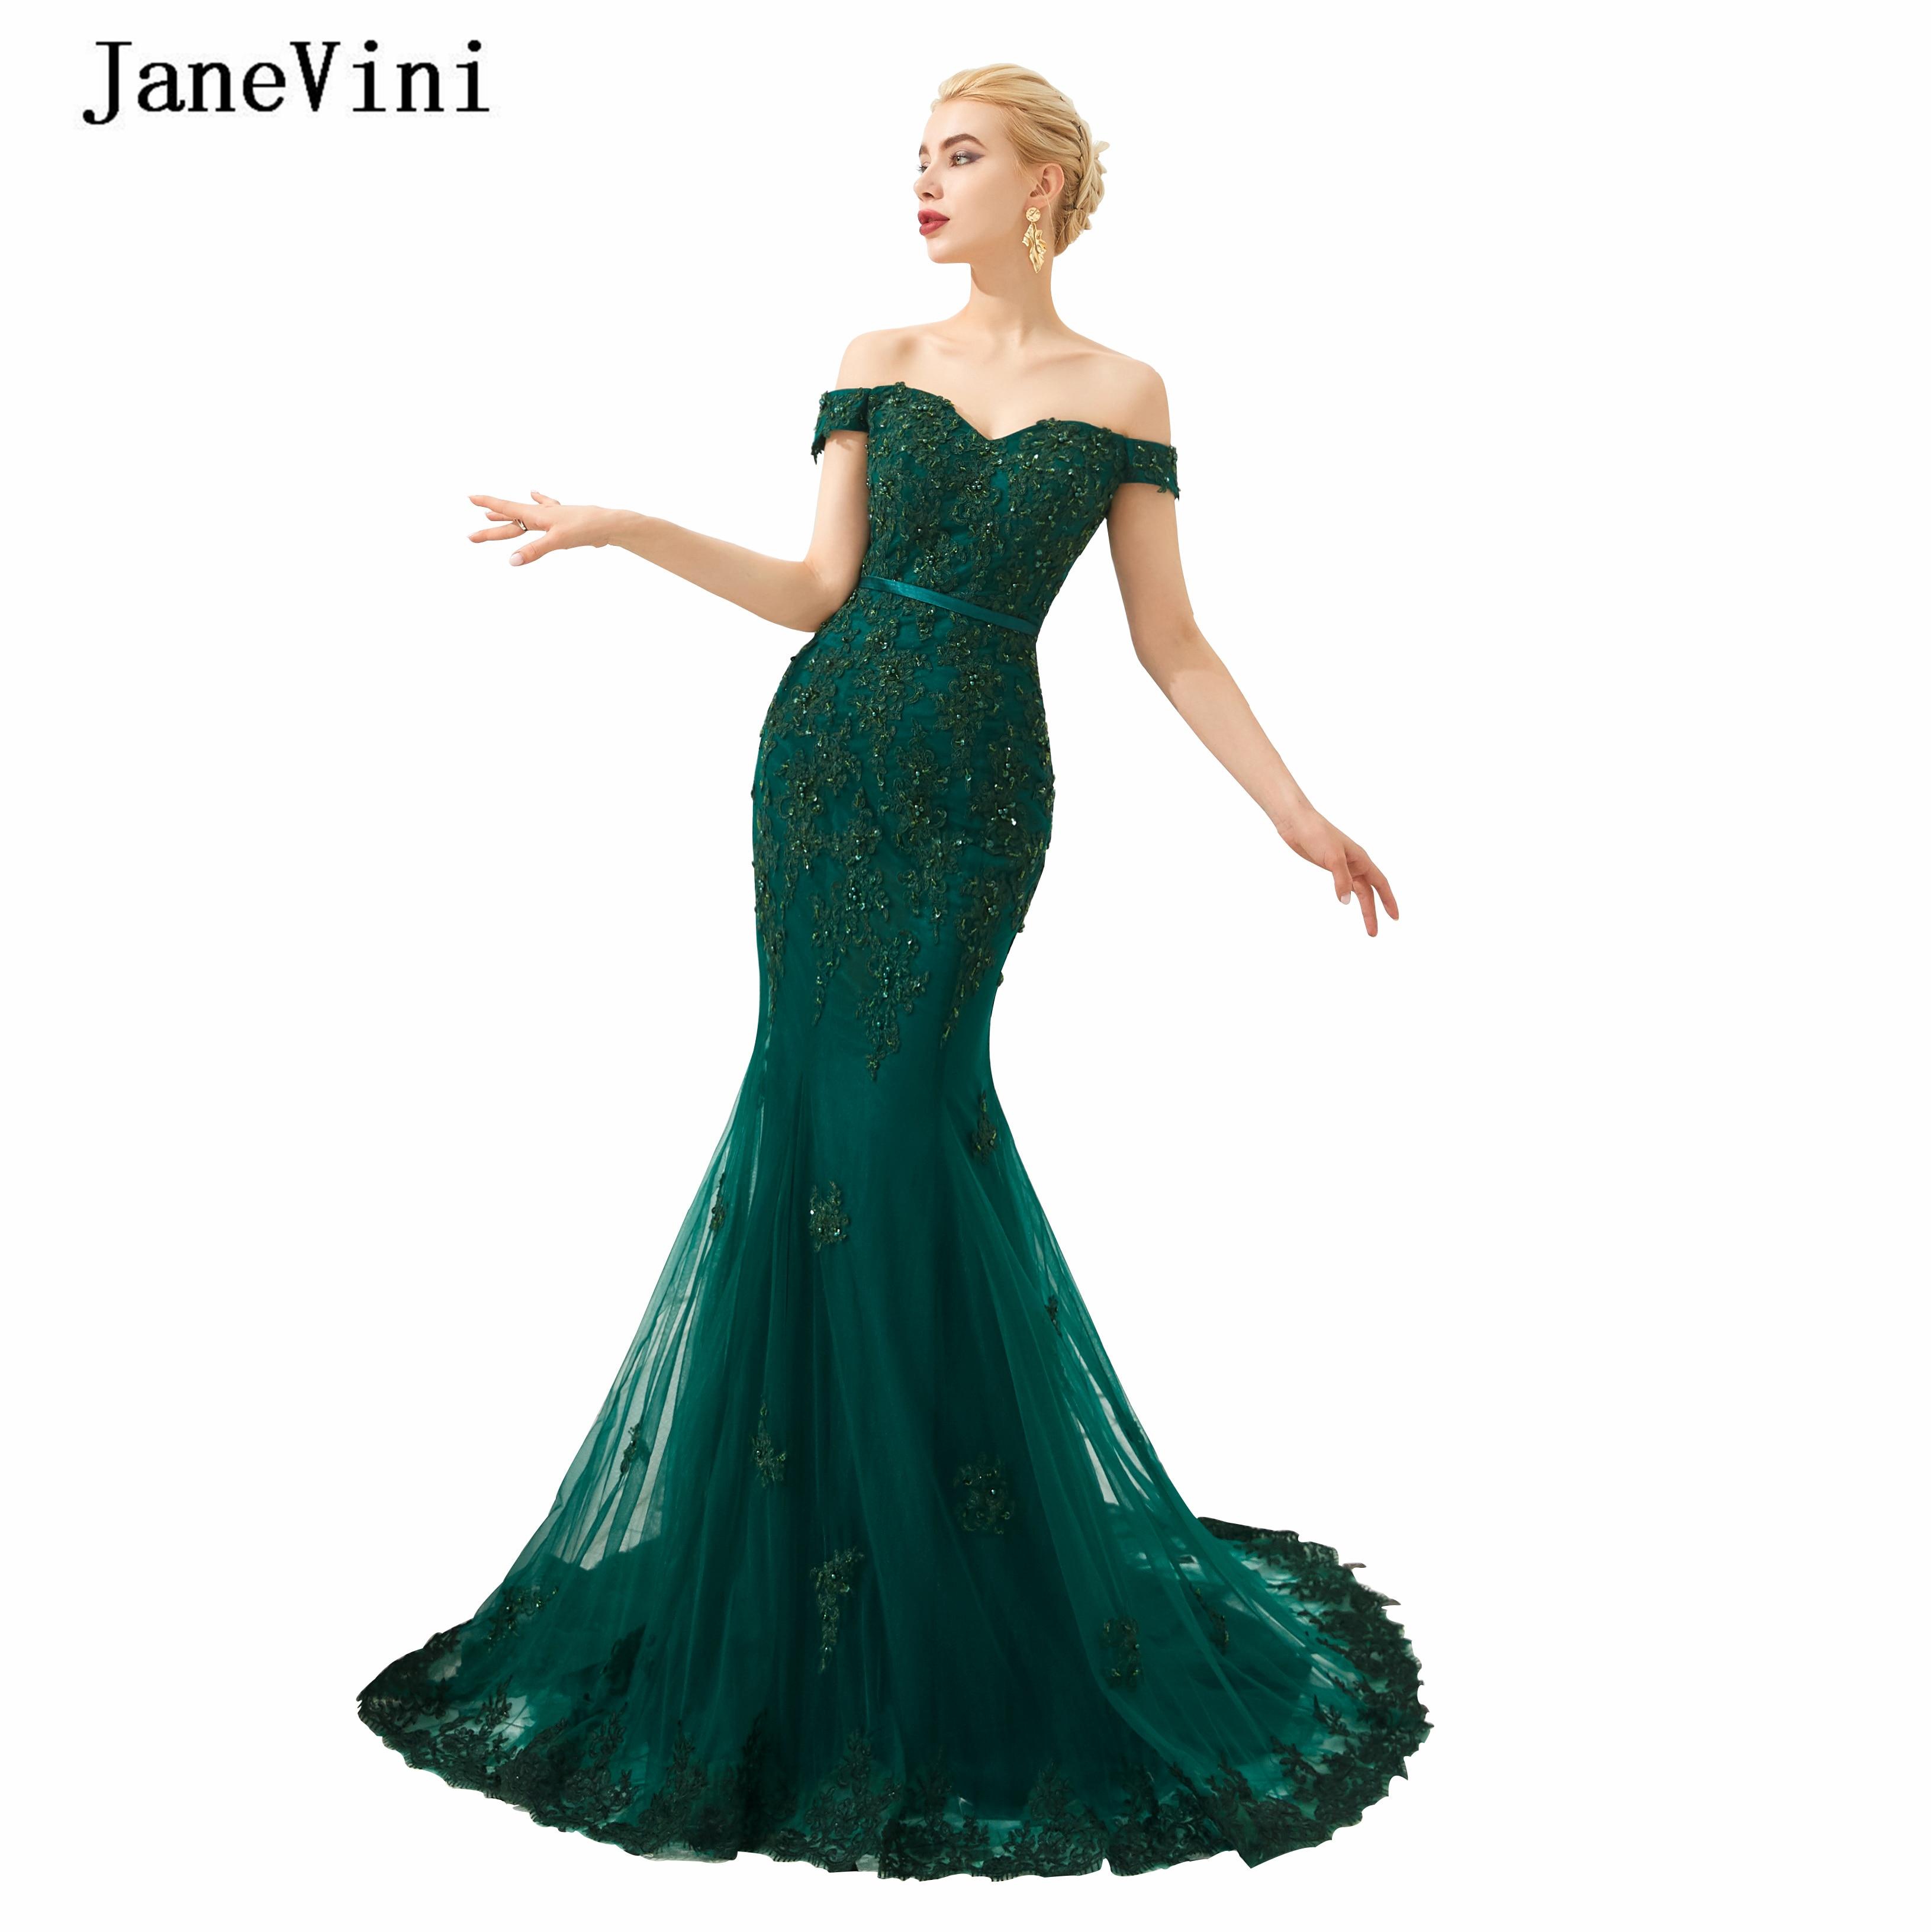 JaneVini Vintage Dark Green Mermaid Long   Prom     Dresses   Off Shoulder Lace Appliques Beaded Tulle Backless Dubai Evening   Dress   2019